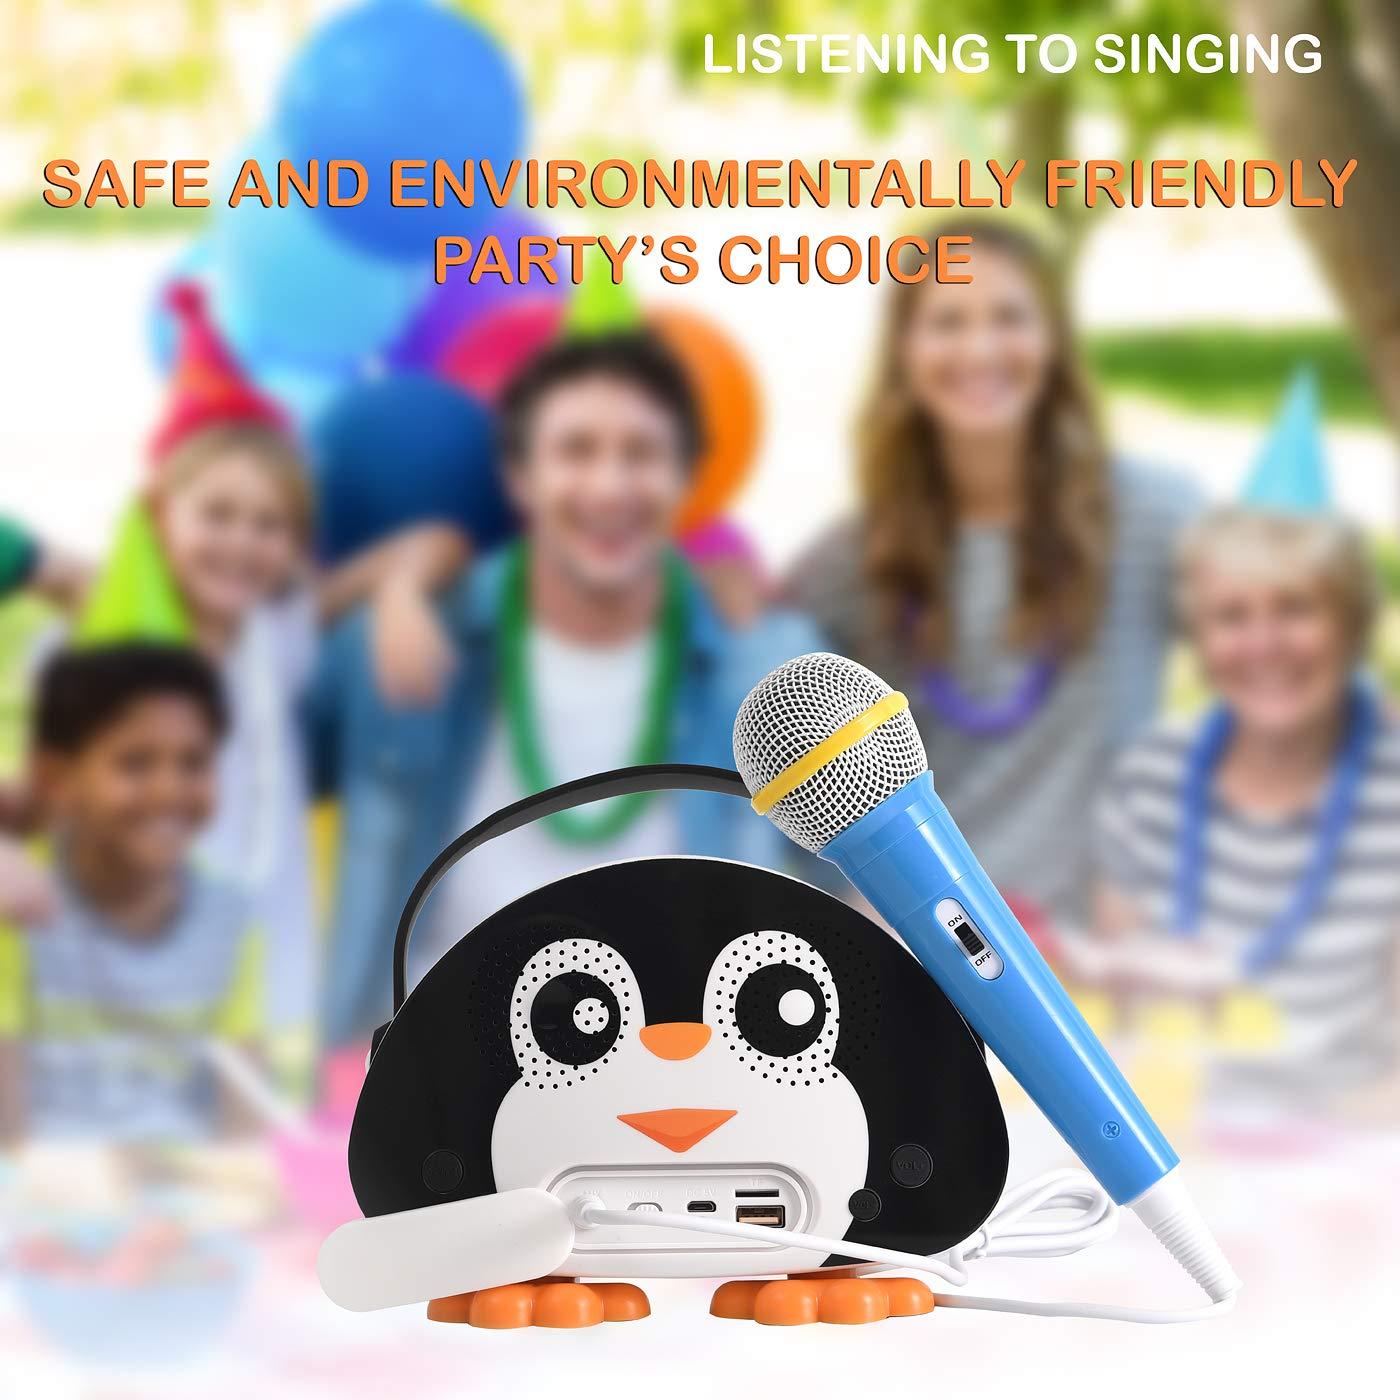 HowQ Outdoor Toys Karaoke Machine , Portable Kids Karaoke Bluetooth Speaker Wireless Cartoon Speaker for Kids for Indoor Toys Travel Activities with Microphone Penguin Karaoke Machine(Black-White) by HowQ (Image #8)